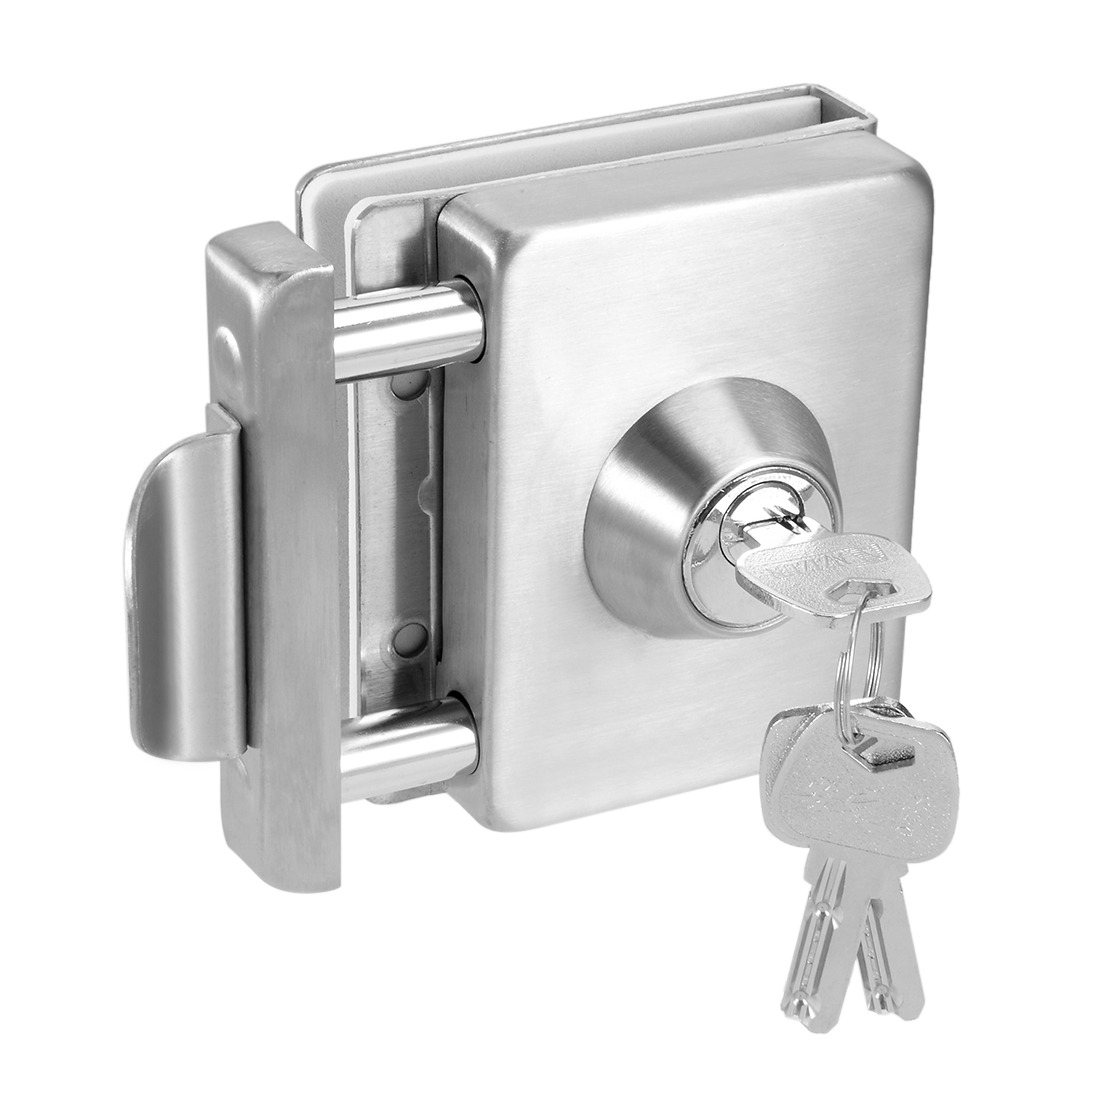 10mm-12mm Glass Door Double Latch Lock Stainless Steel Brushed Finish w Keys